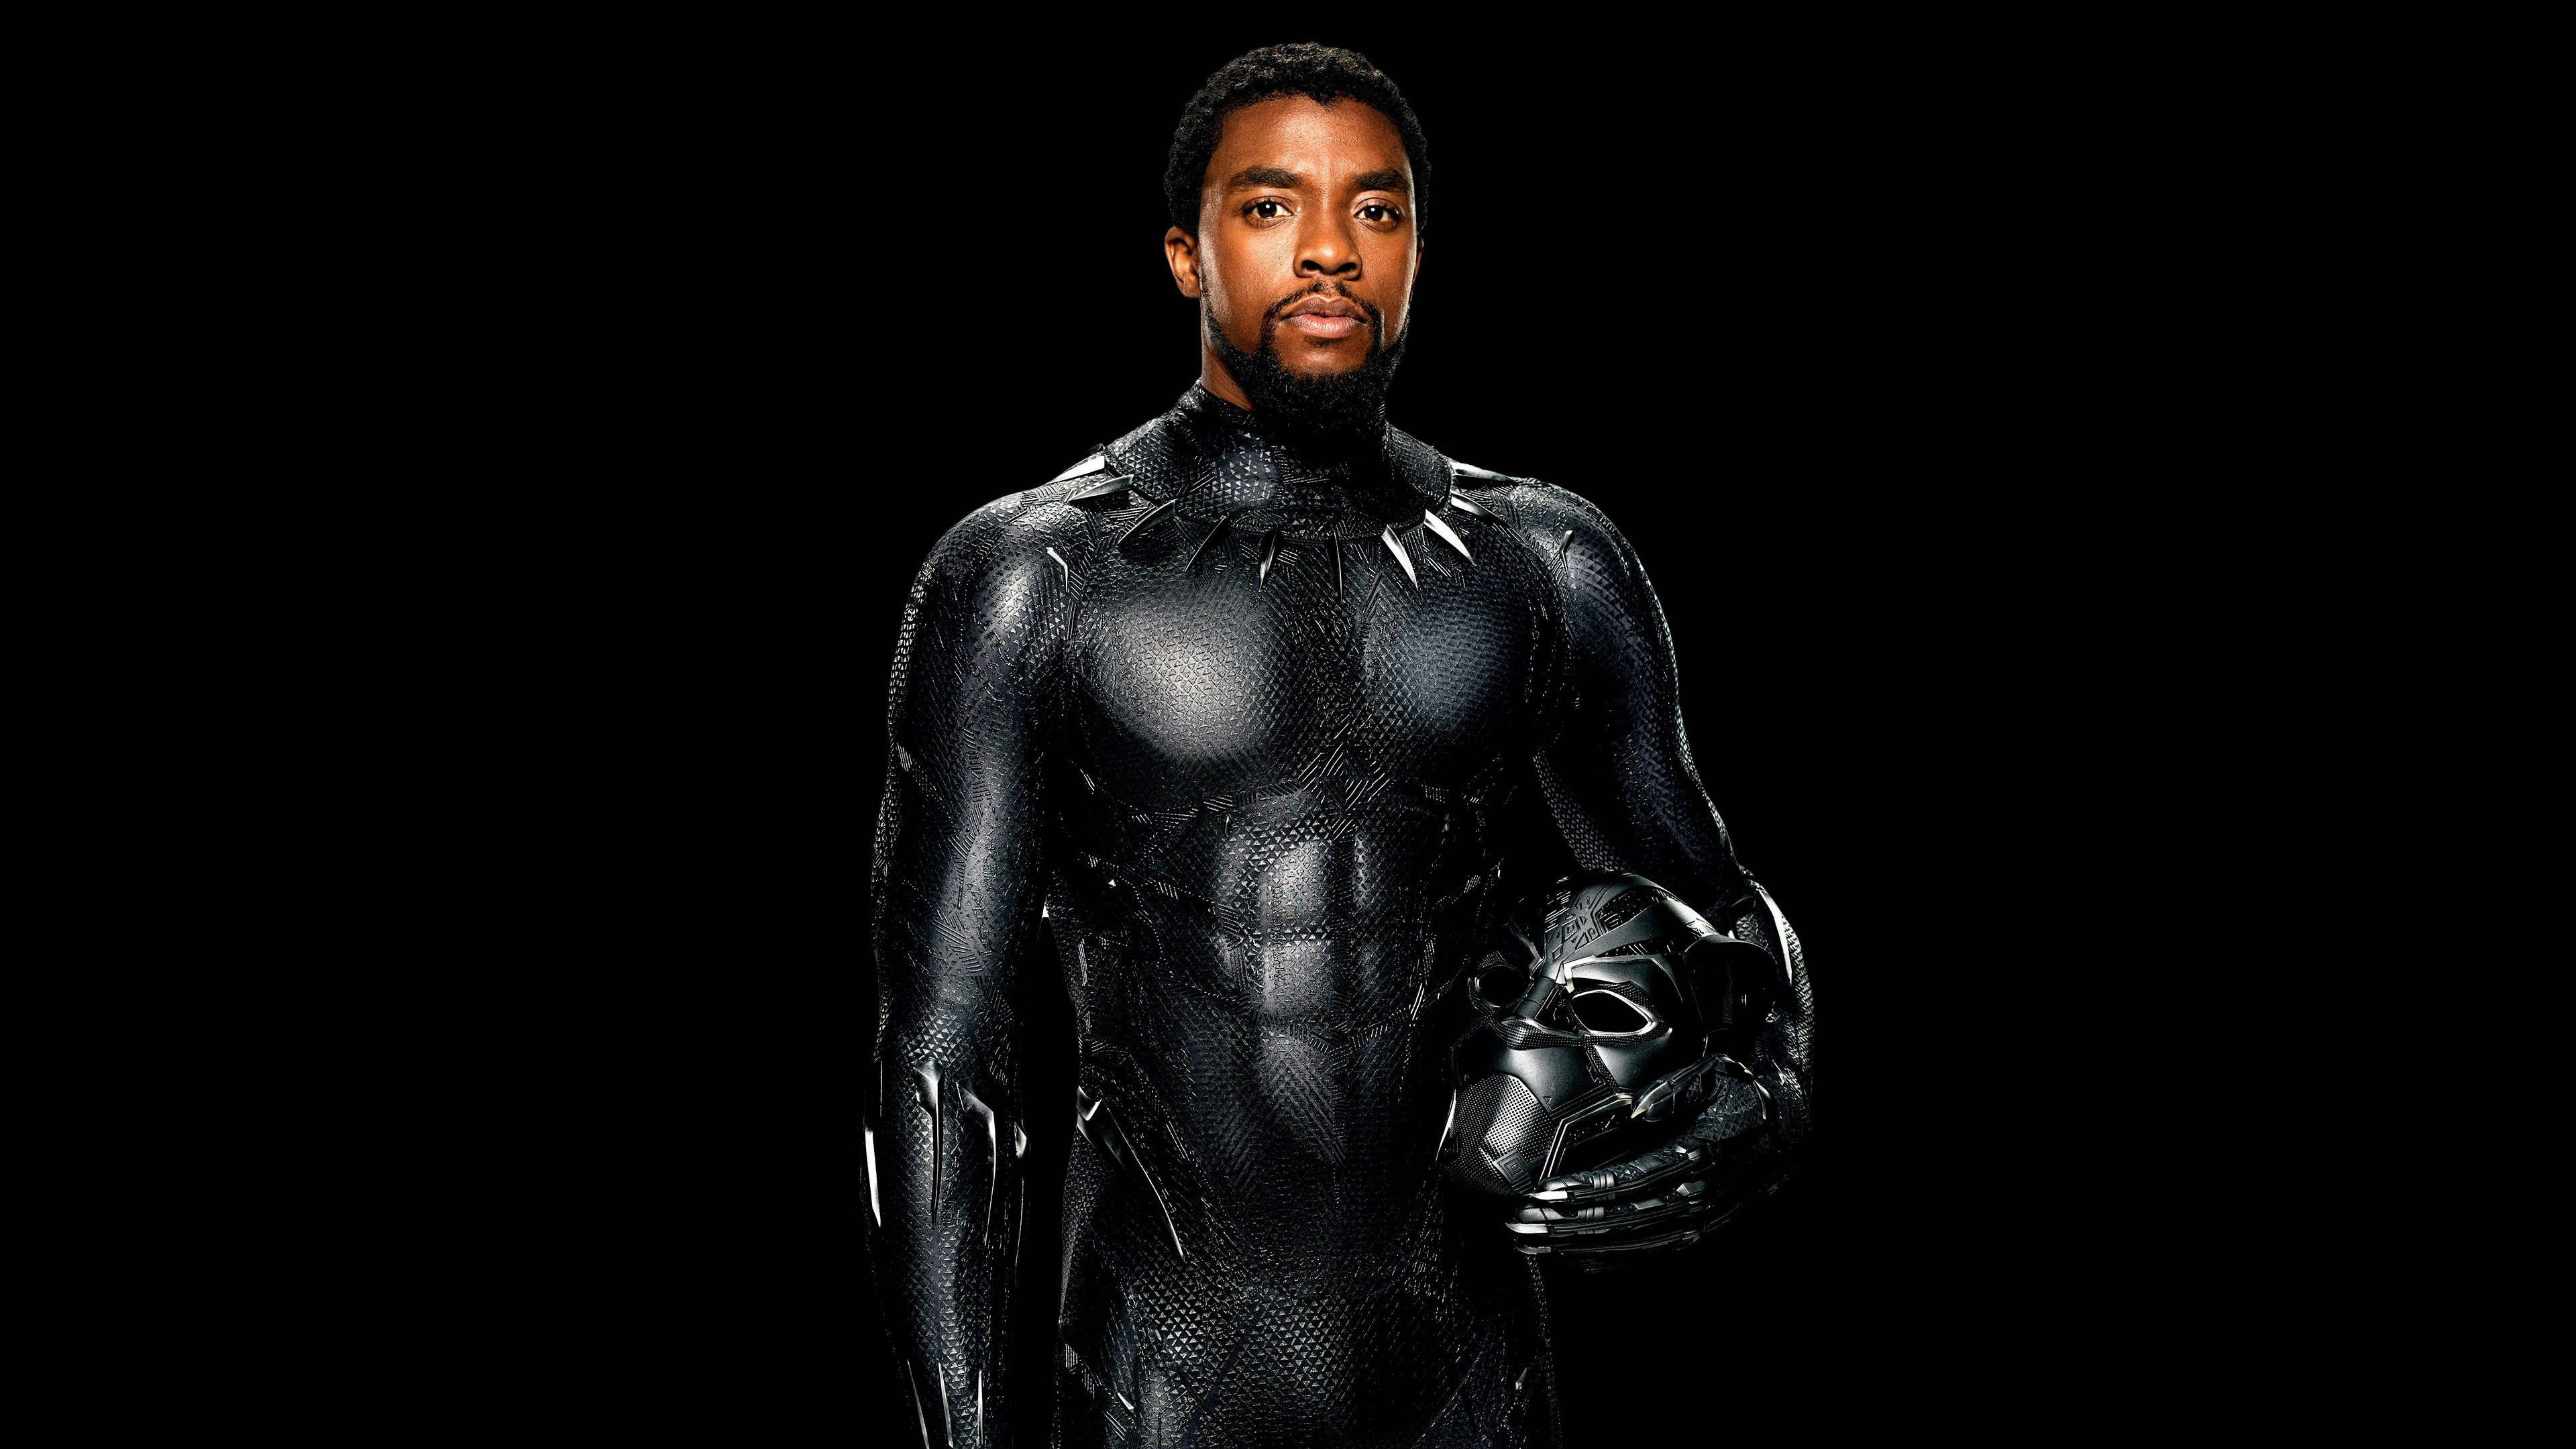 2932x2932 Pubg Android Game 4k Ipad Pro Retina Display Hd: Wallpaper Black Panther, Chadwick Boseman, 4k, Movies #16436